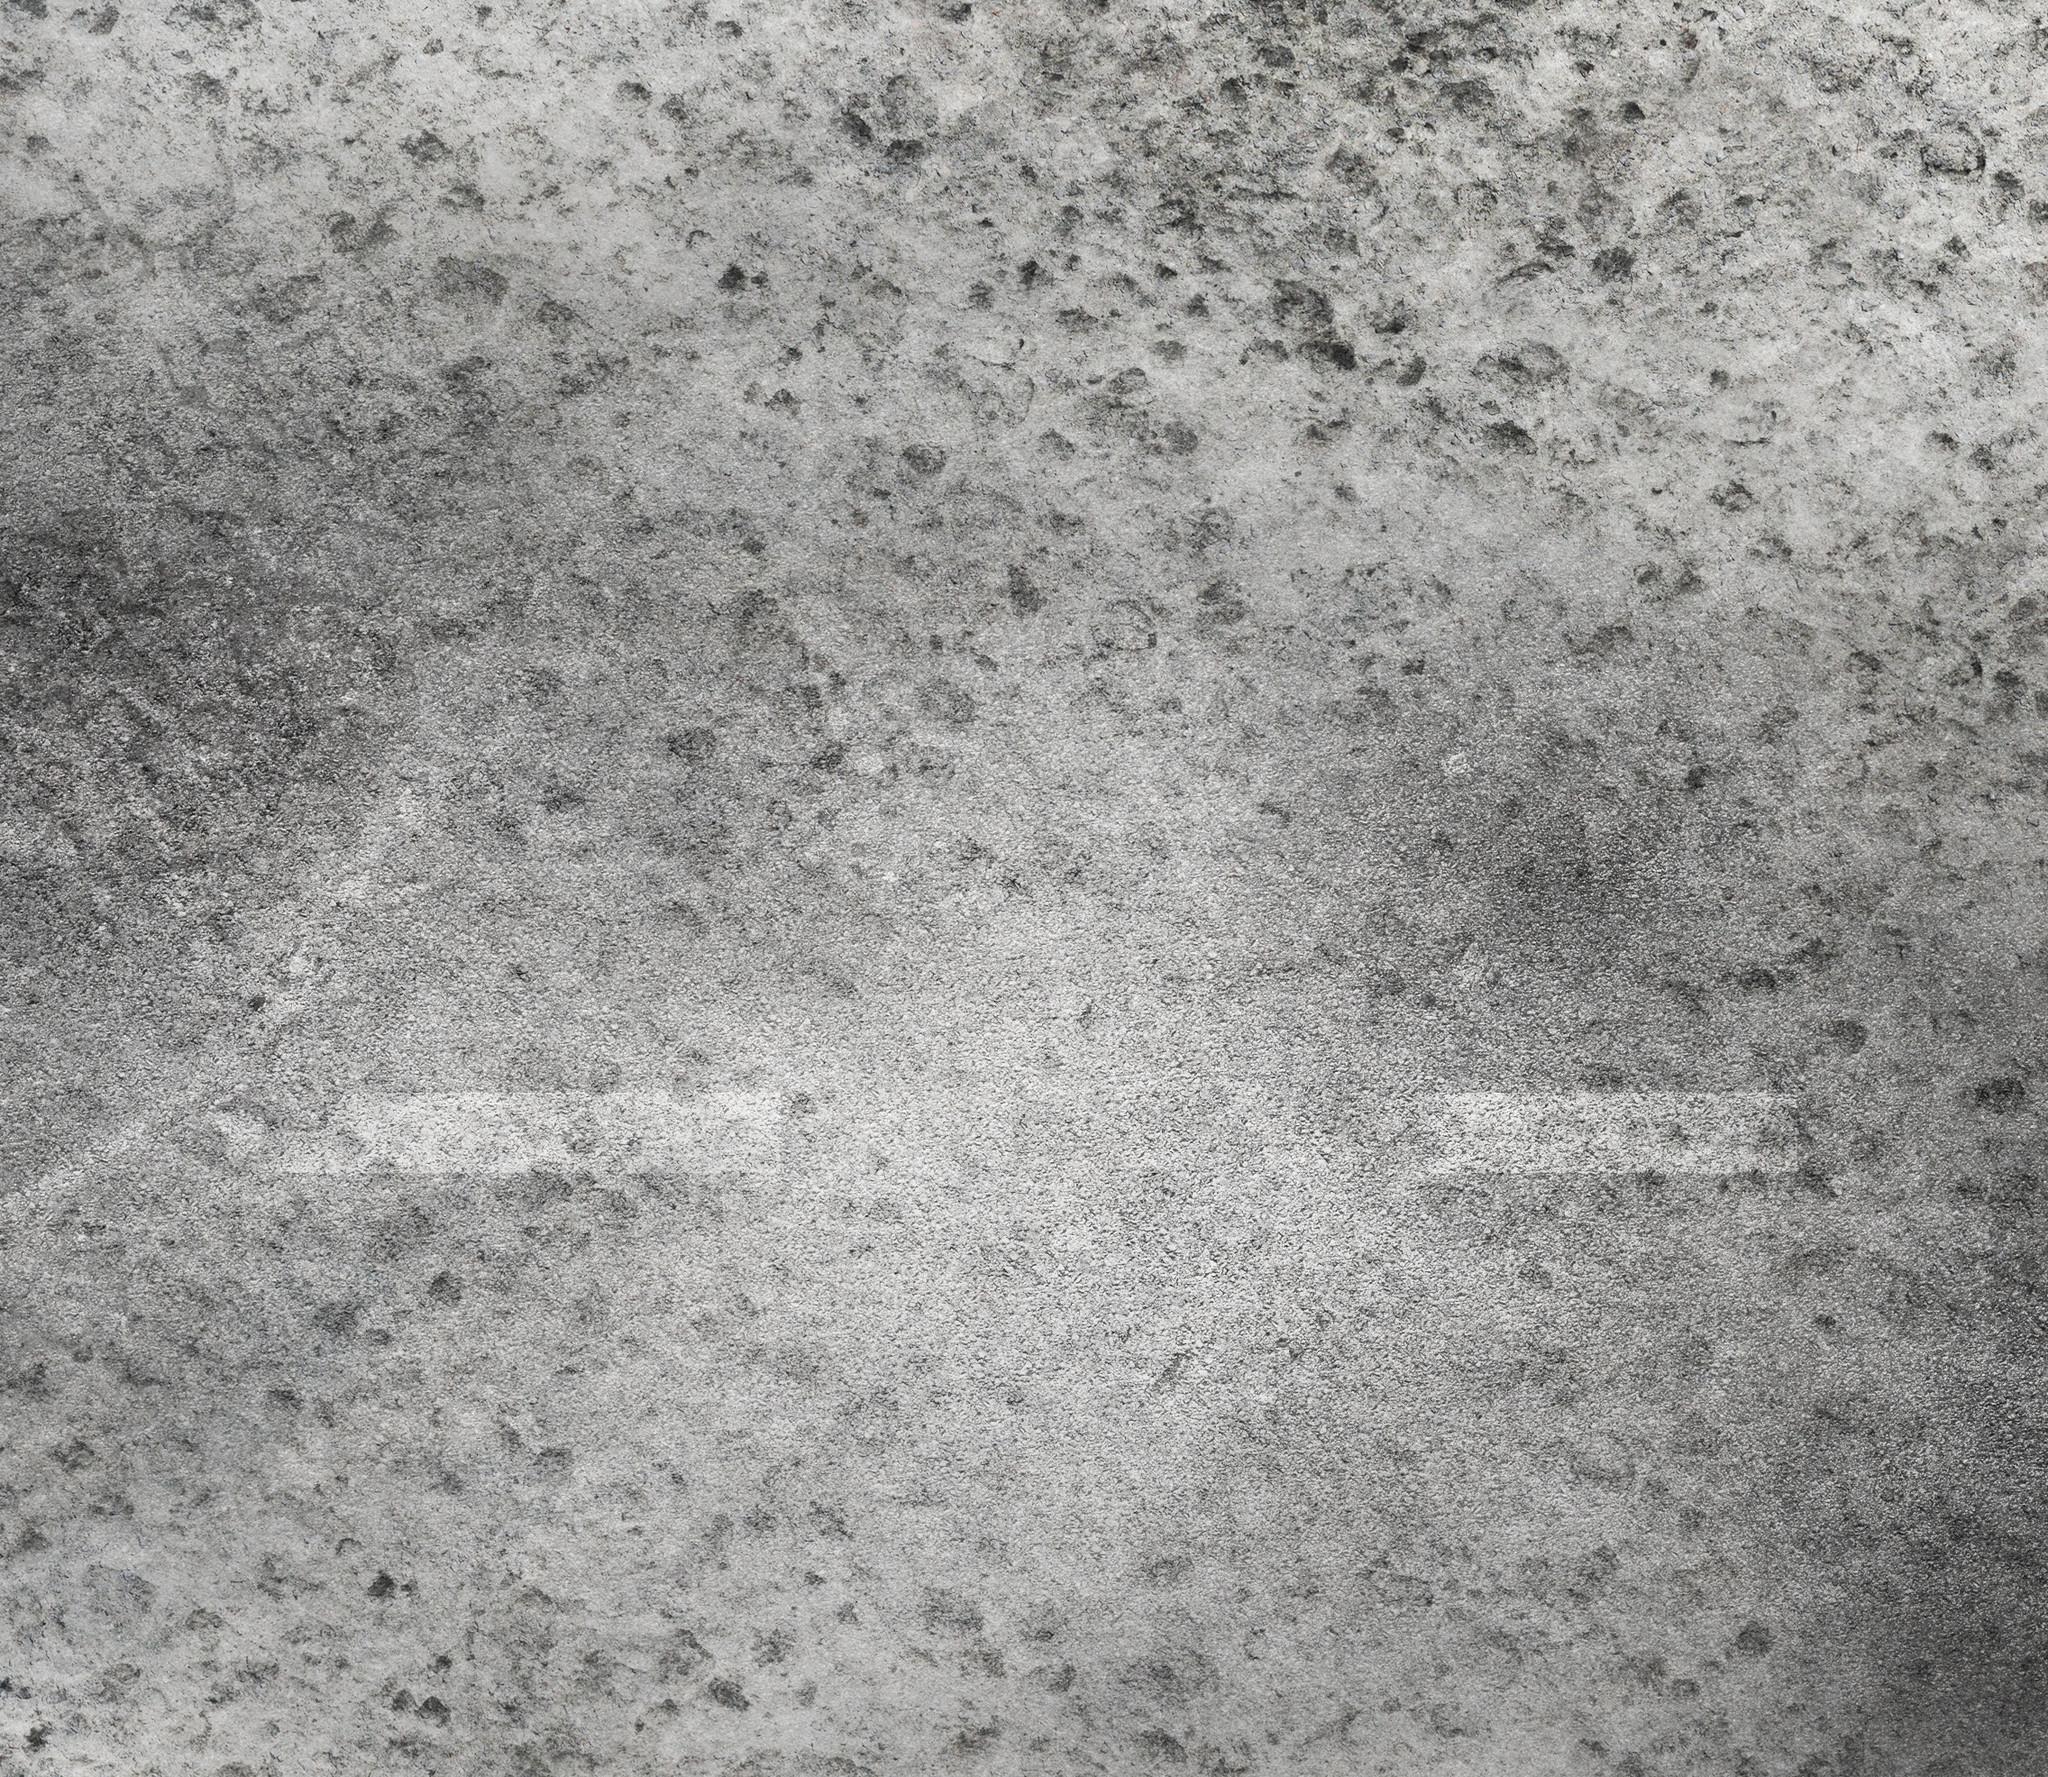 Frontline-Gaming FLG Mats: Ash Waste 6x3'